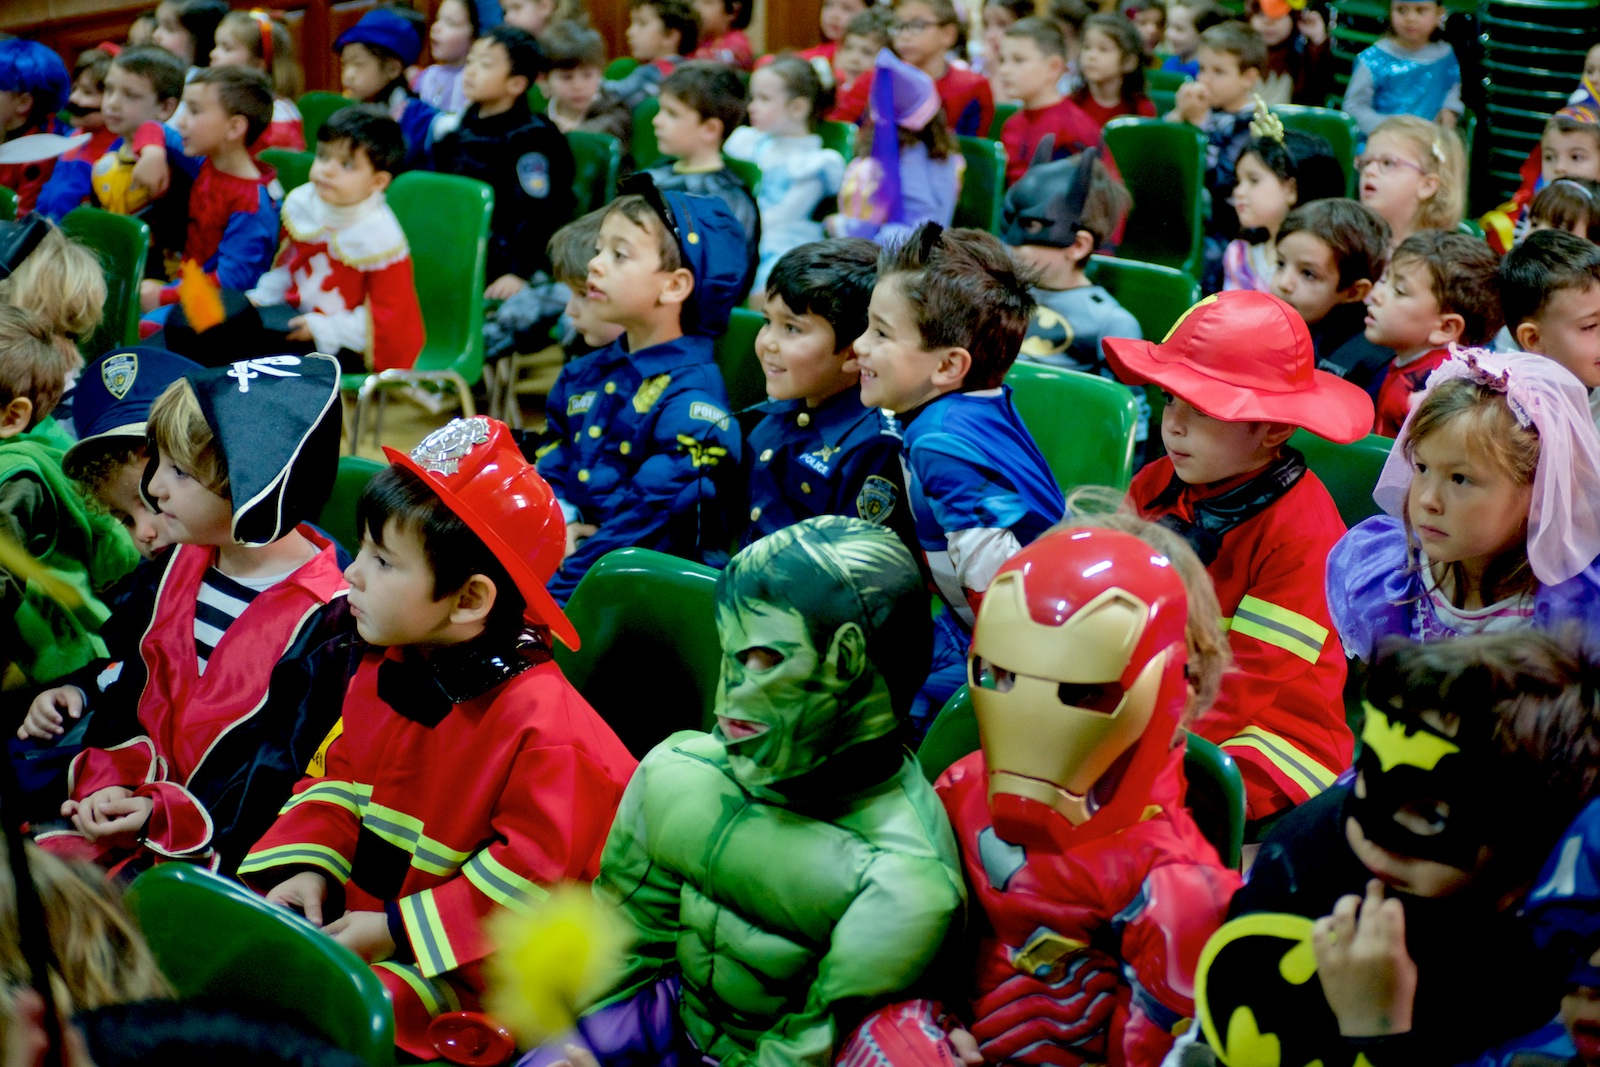 Fiesta de disfraces en Colegio Nazaret